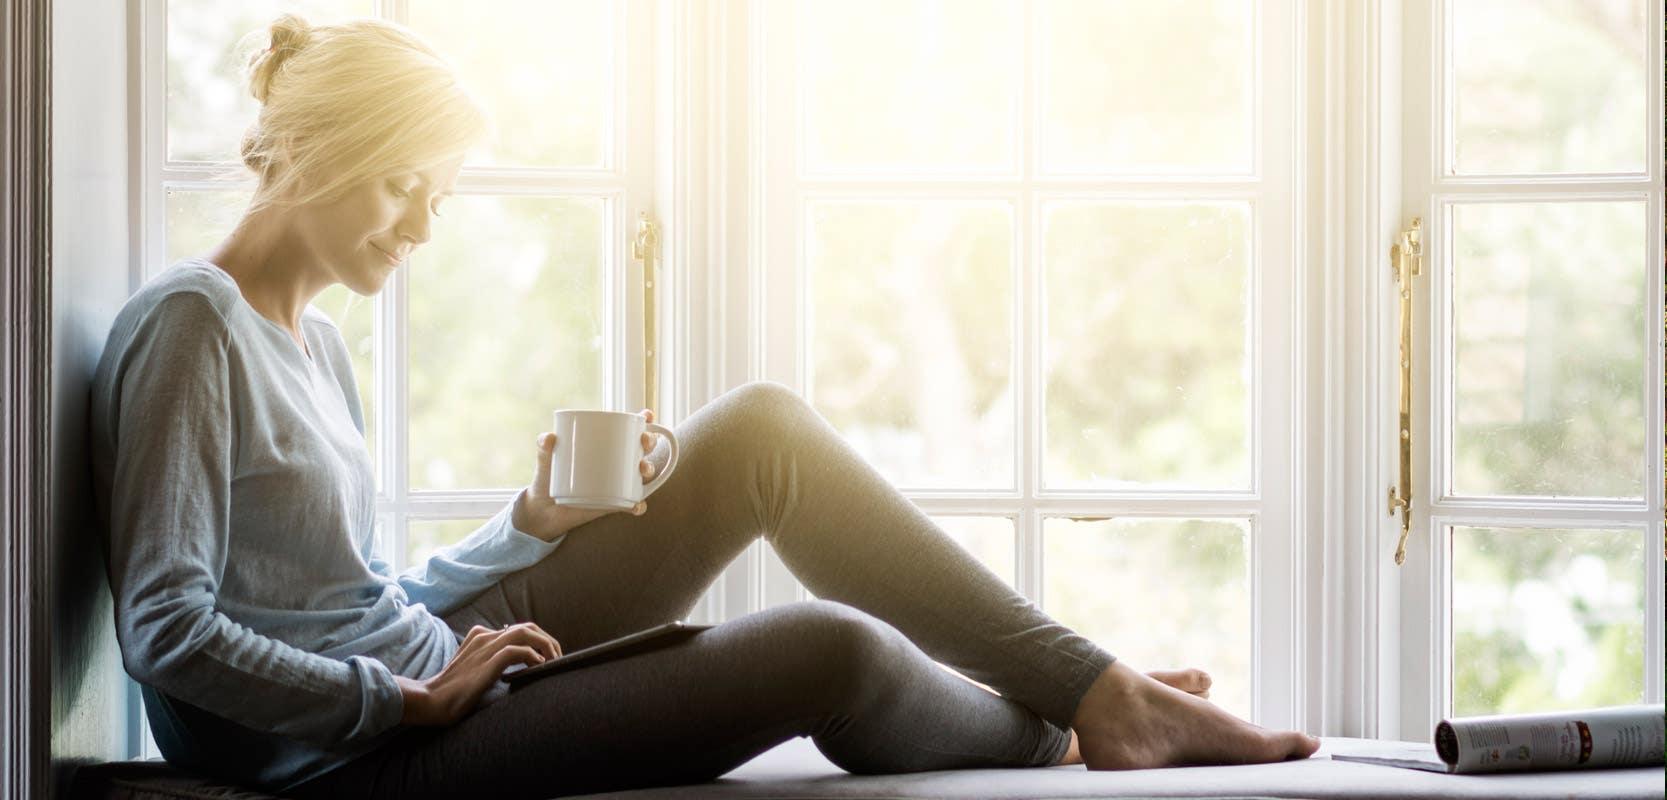 5 Tips When Choosing Furniture To Improve Your Indoor Health